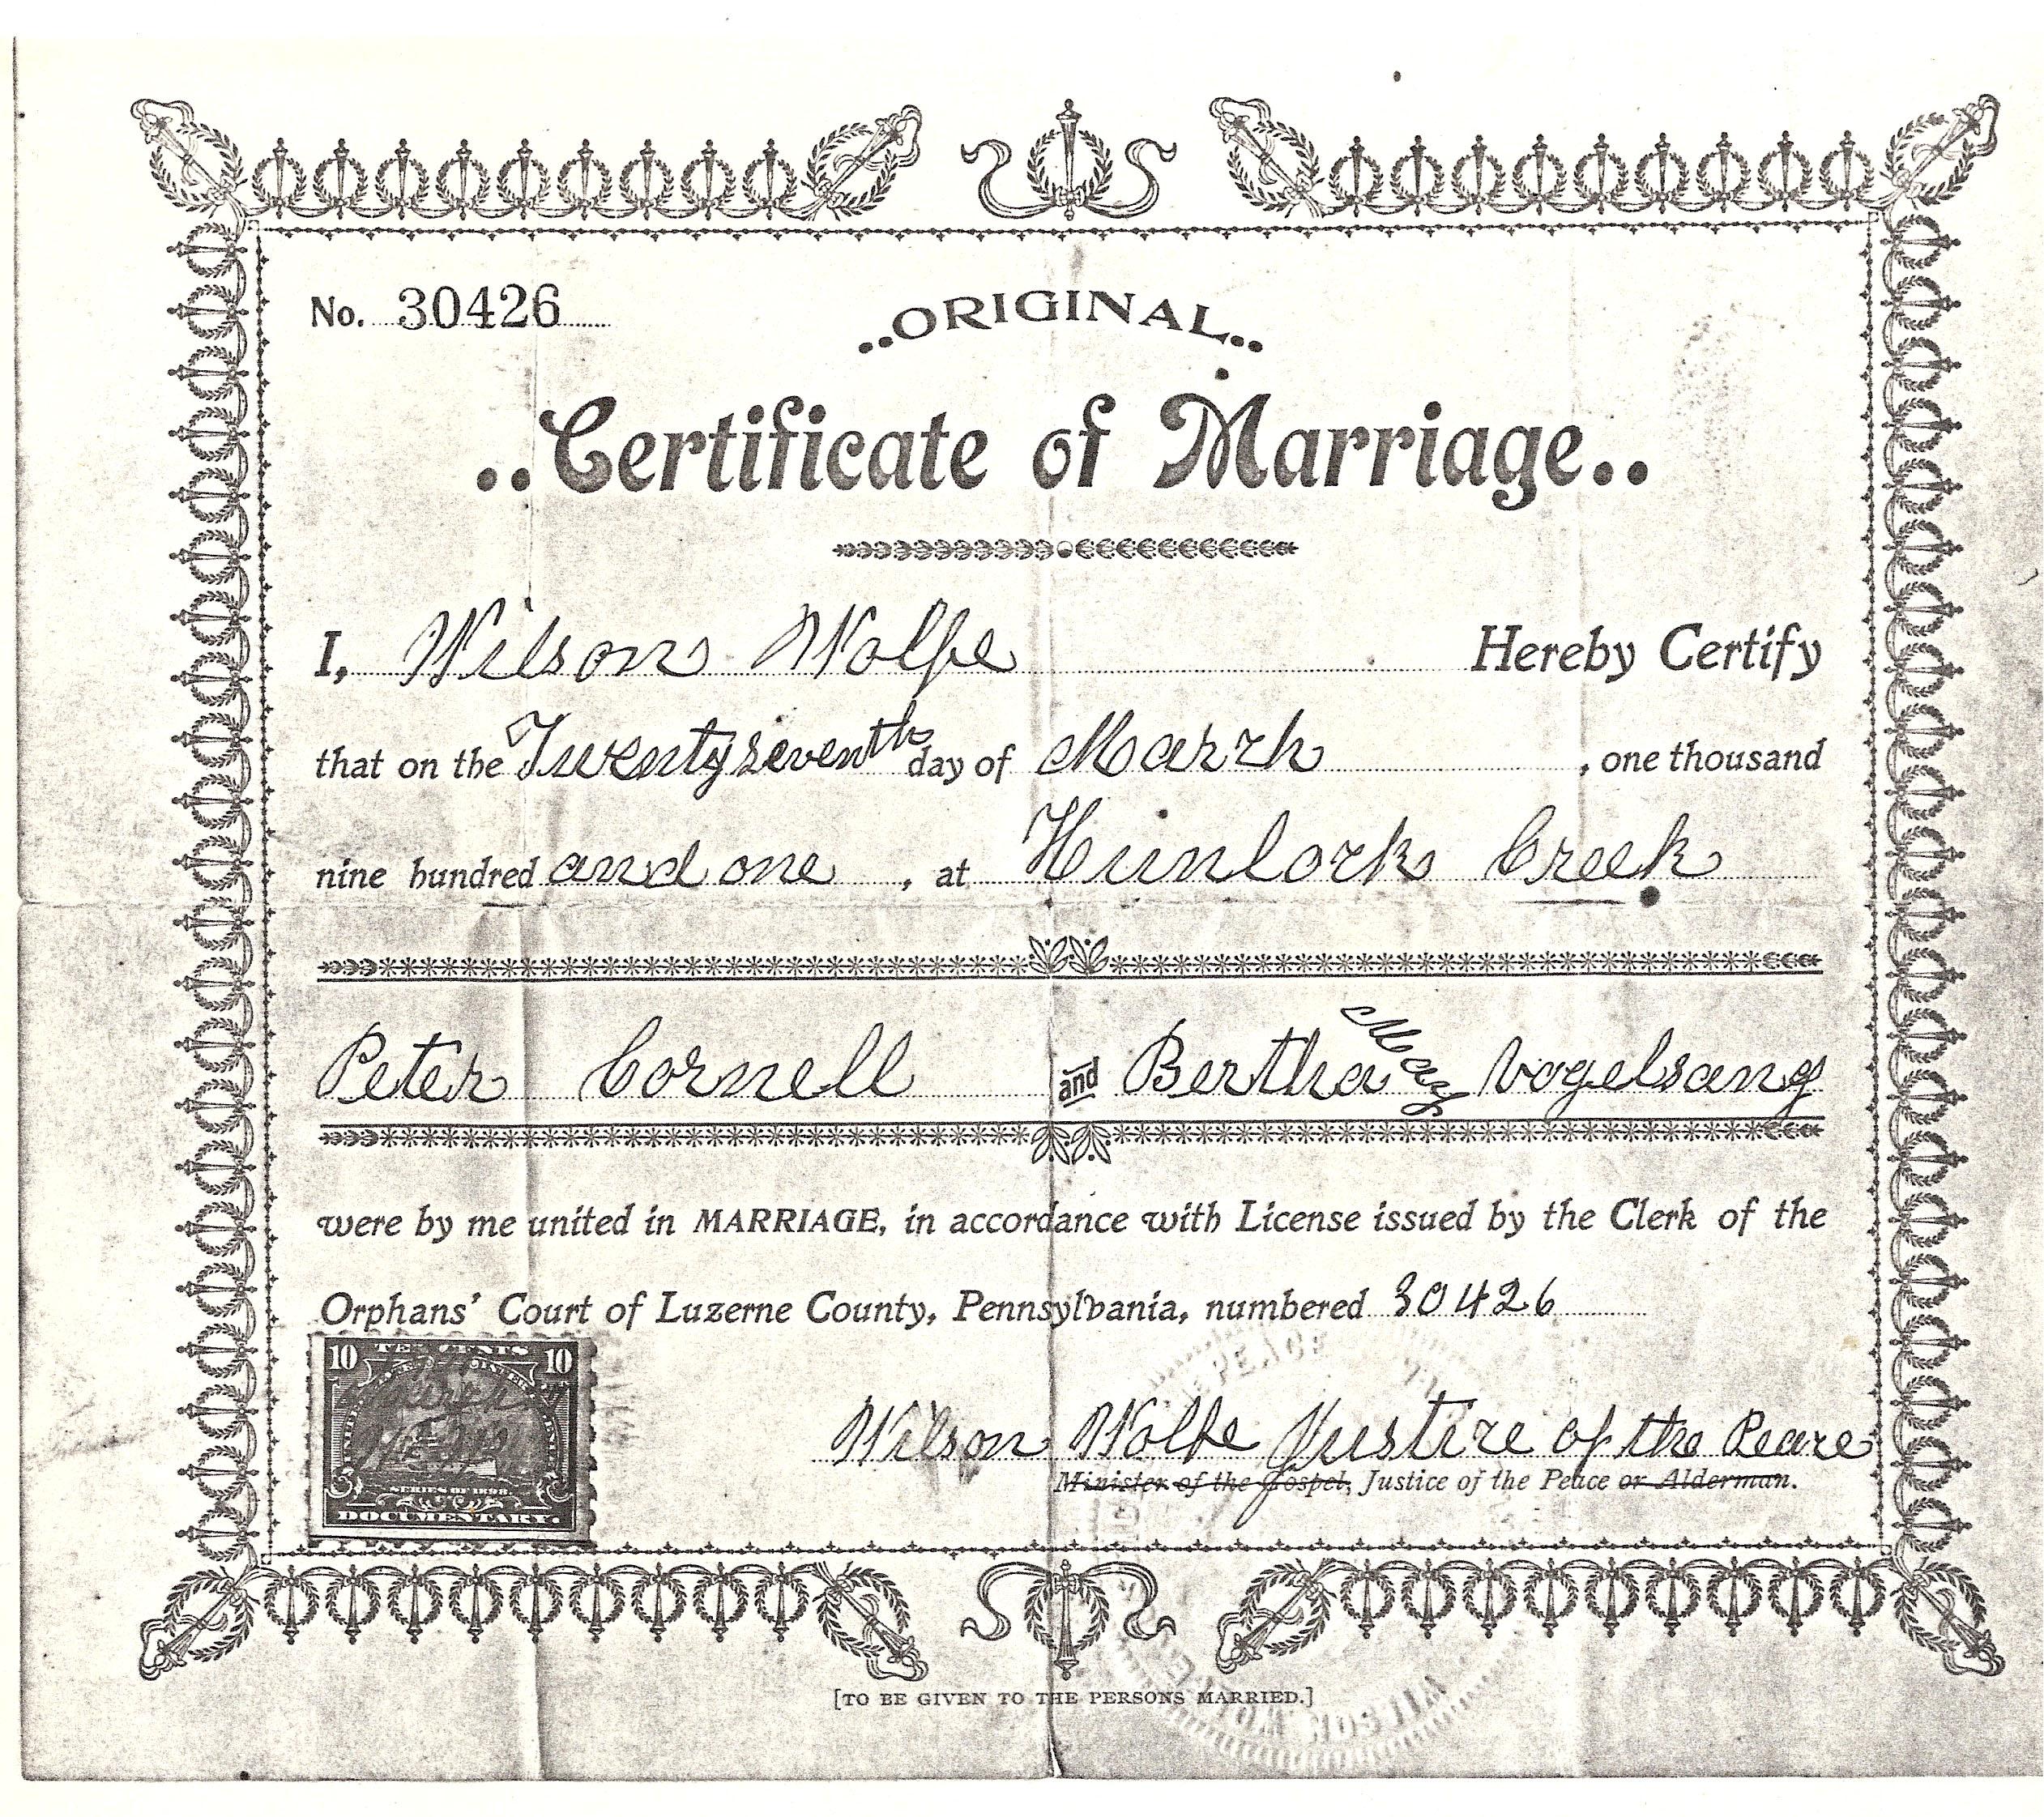 Awesome image of san bernardino birth certificate business cards bertha may vogelsang born about 1882 bertha may vogelsang born about 1882 from san bernardino birth certificate aiddatafo Images